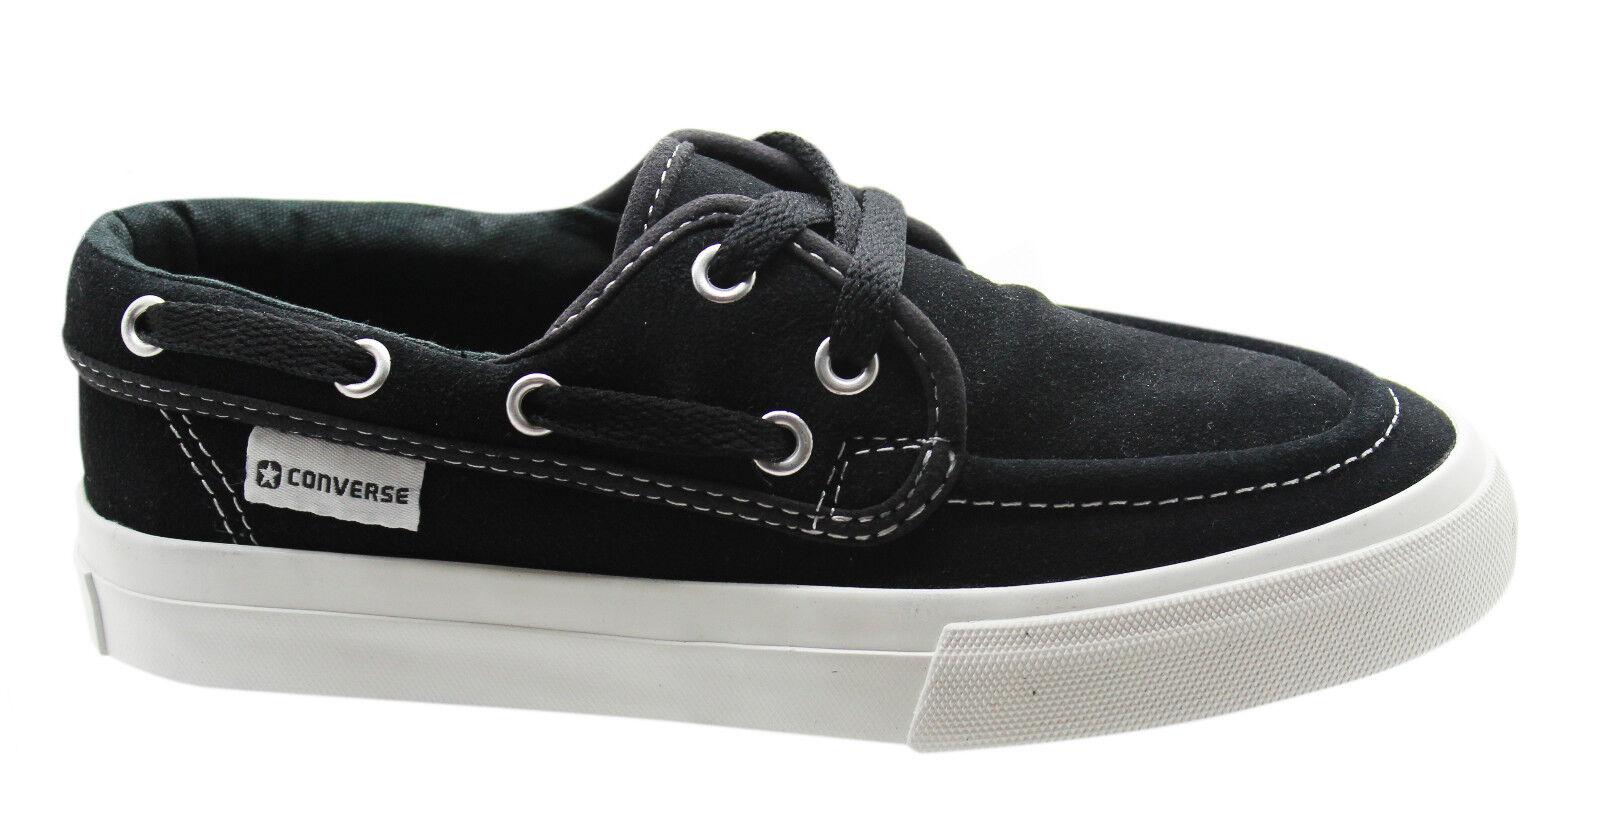 e4d08a2d1b0 Converse Sea Star OX Mens Boat Shoe Trainers Black Suede Lace Up ...